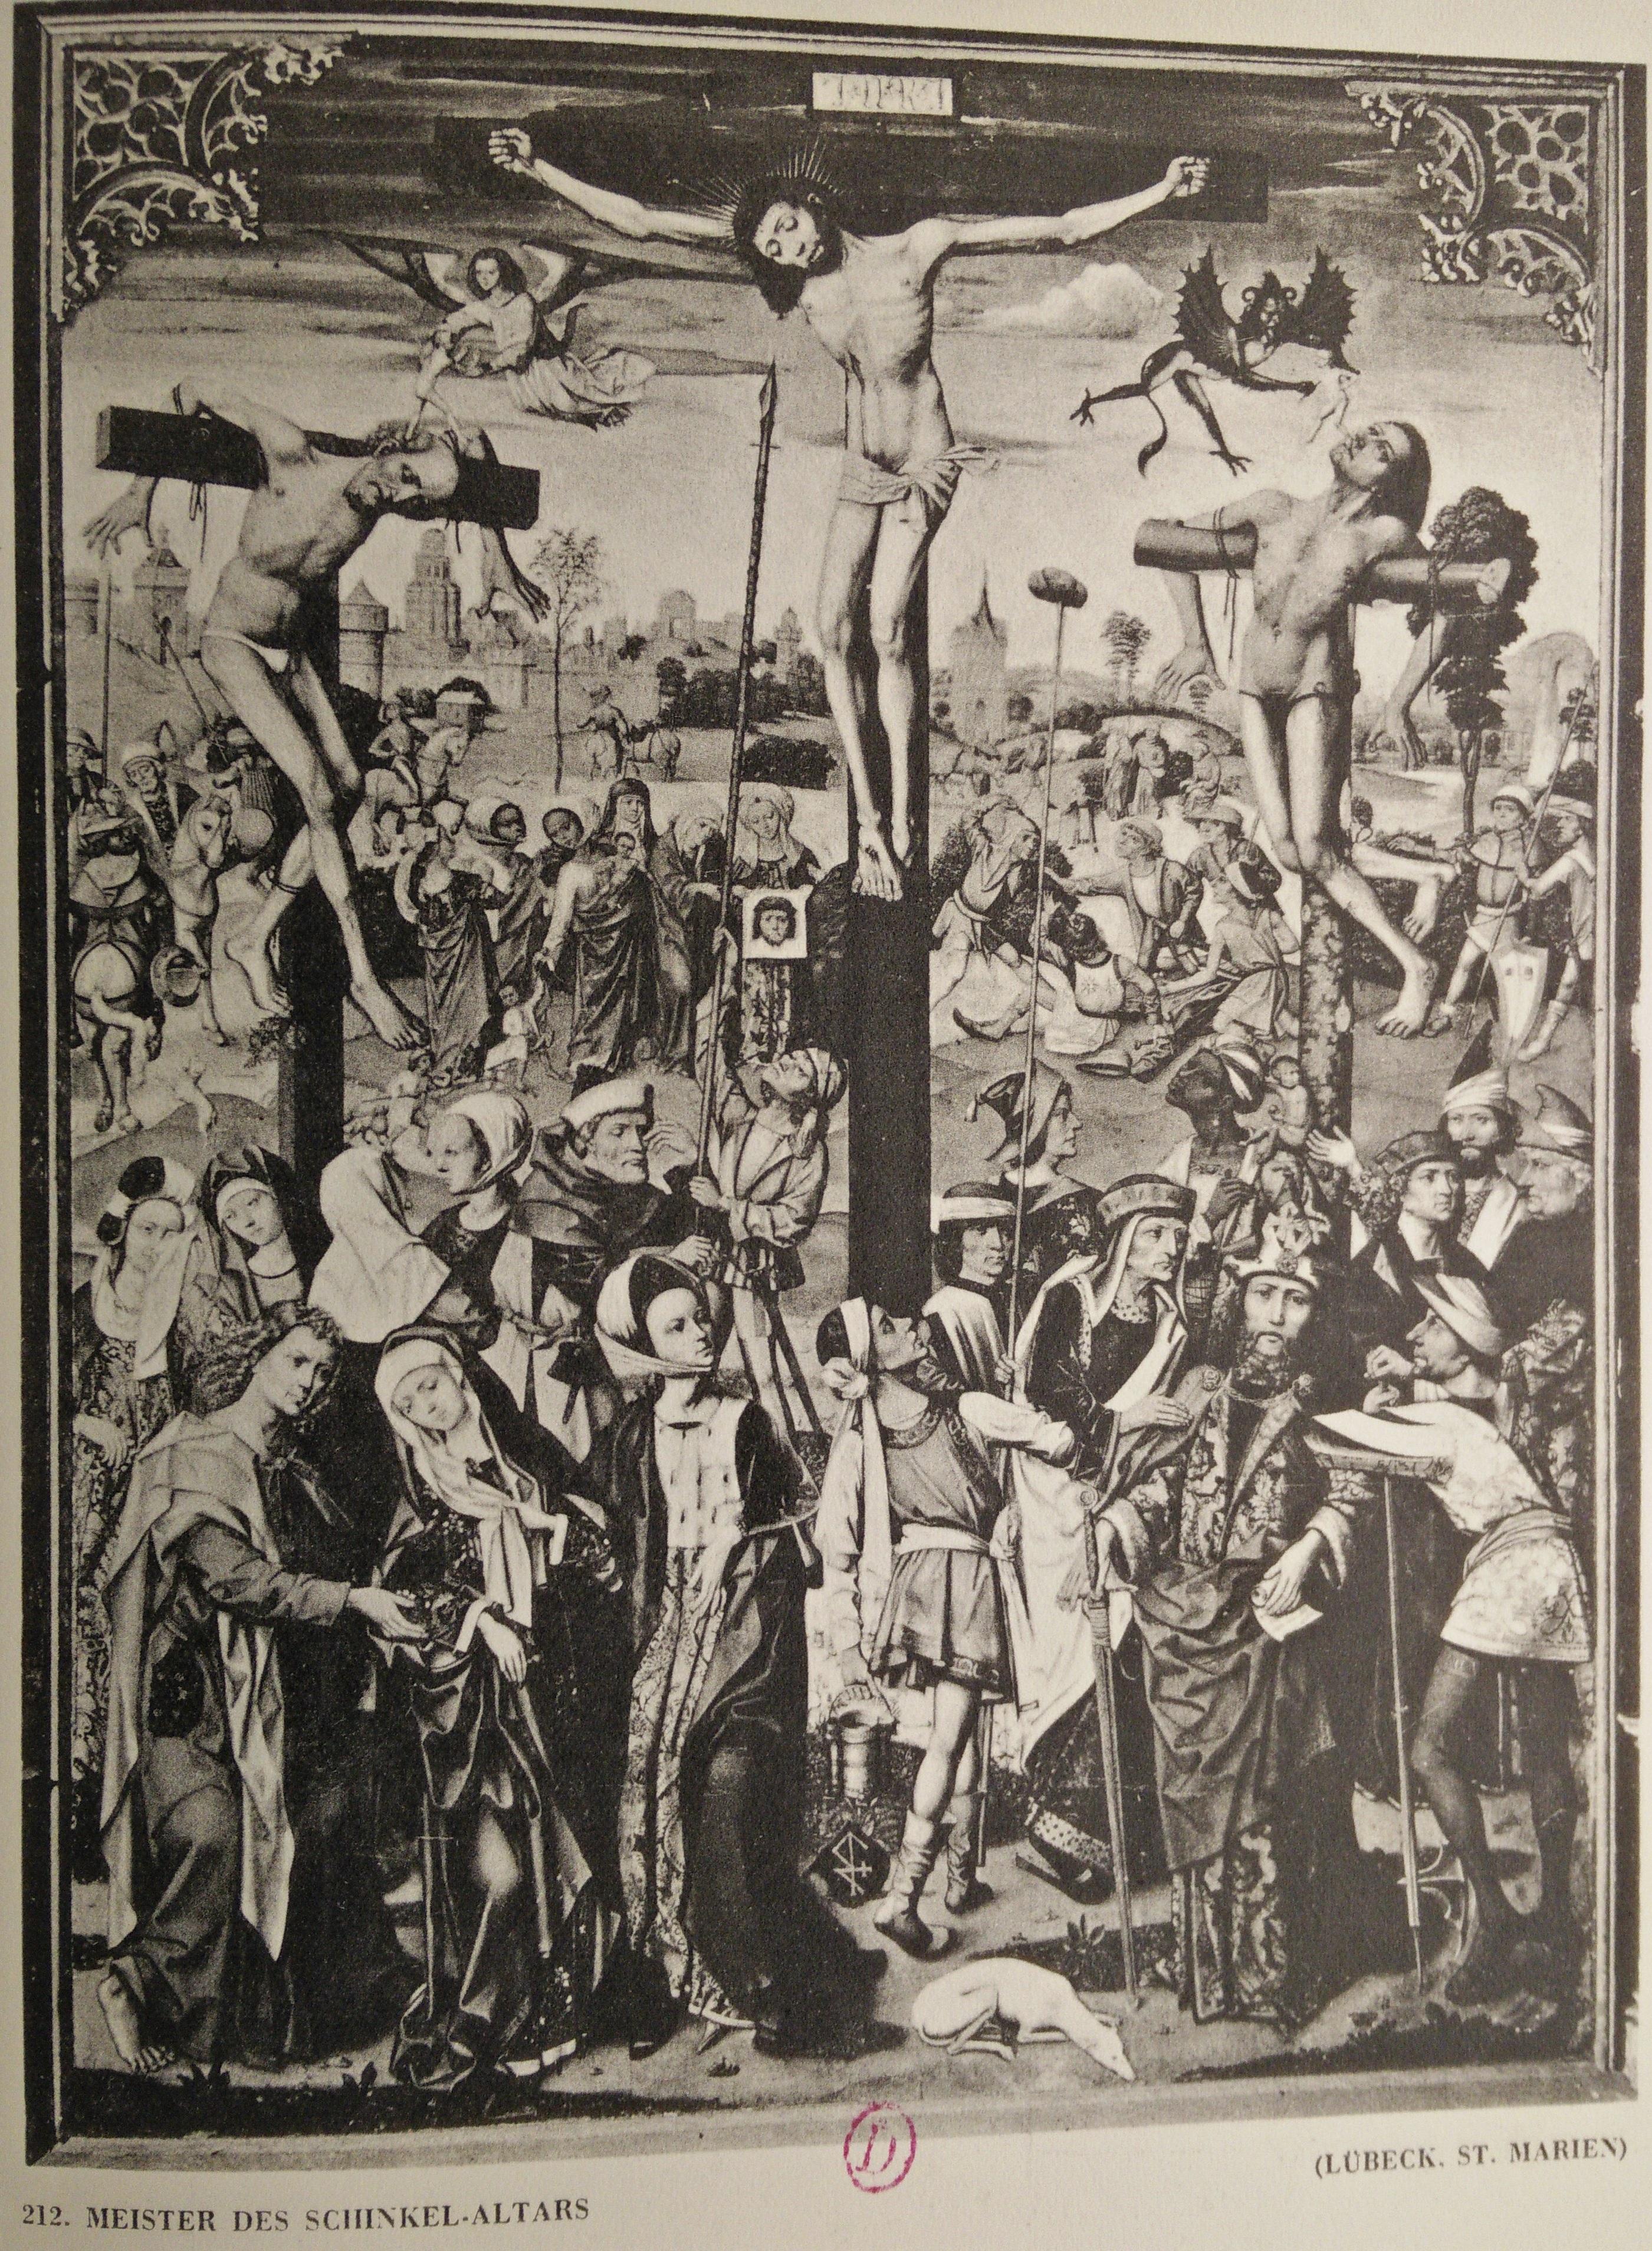 Meister des schinkel altars 1501 Lubeck St Marien detruit en 1942